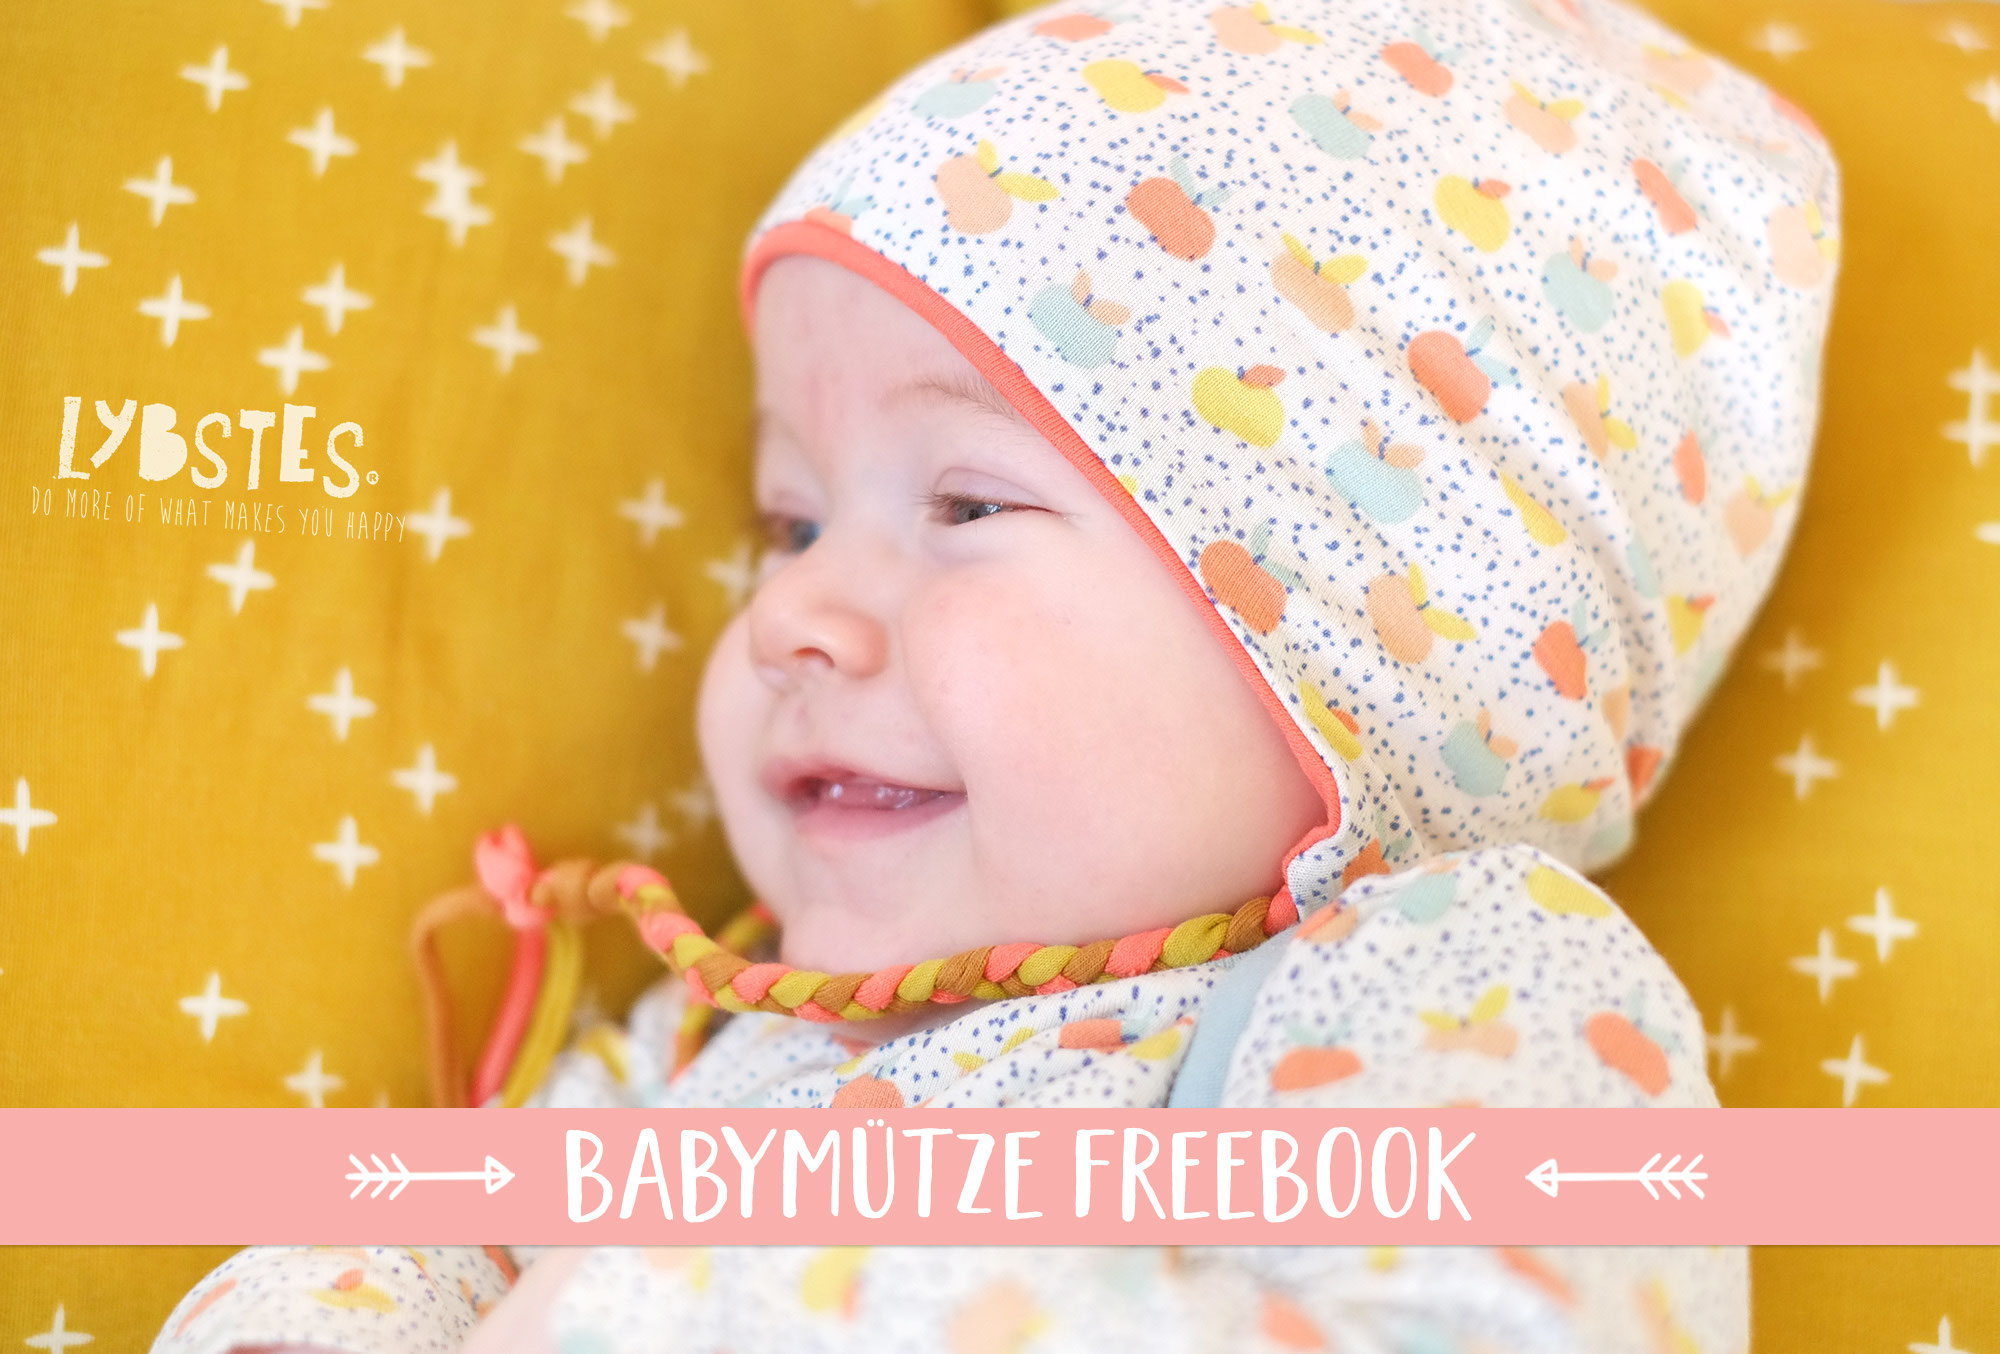 4ade0a57ccde89 FREEBOOK: Babymütze mit Ohrenschutz nähen - Lybstes.